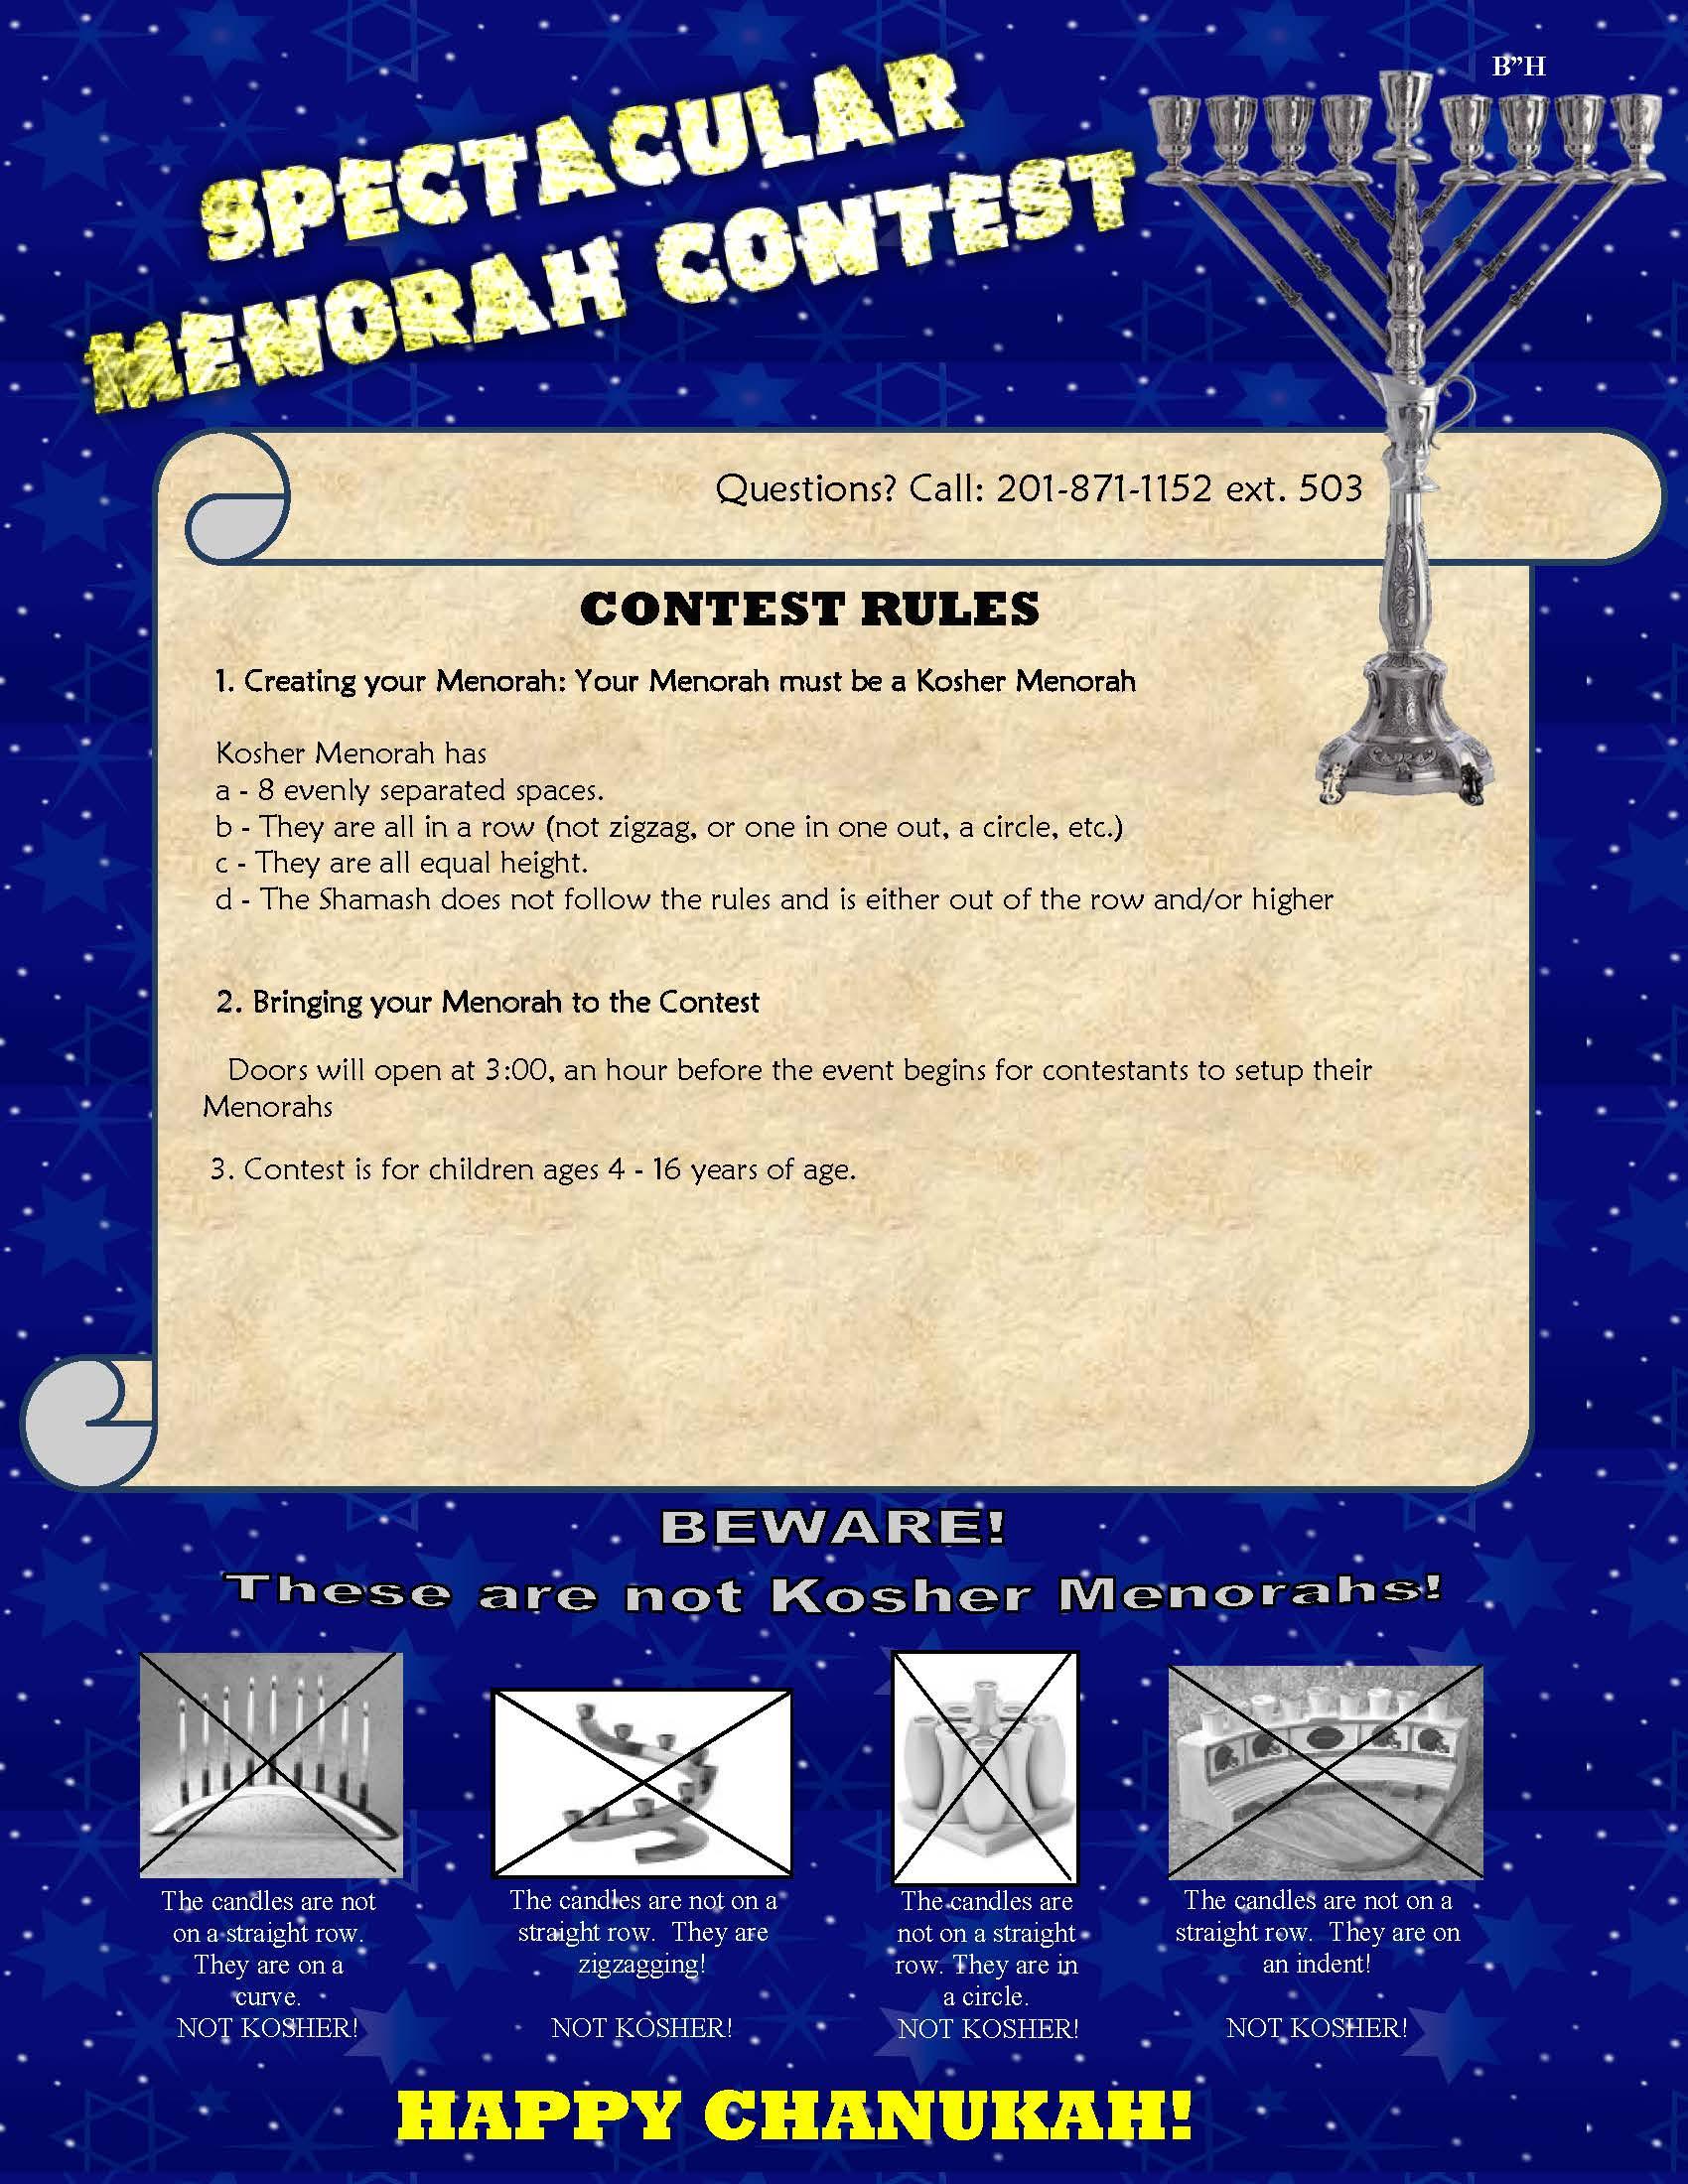 rules5776.jpg